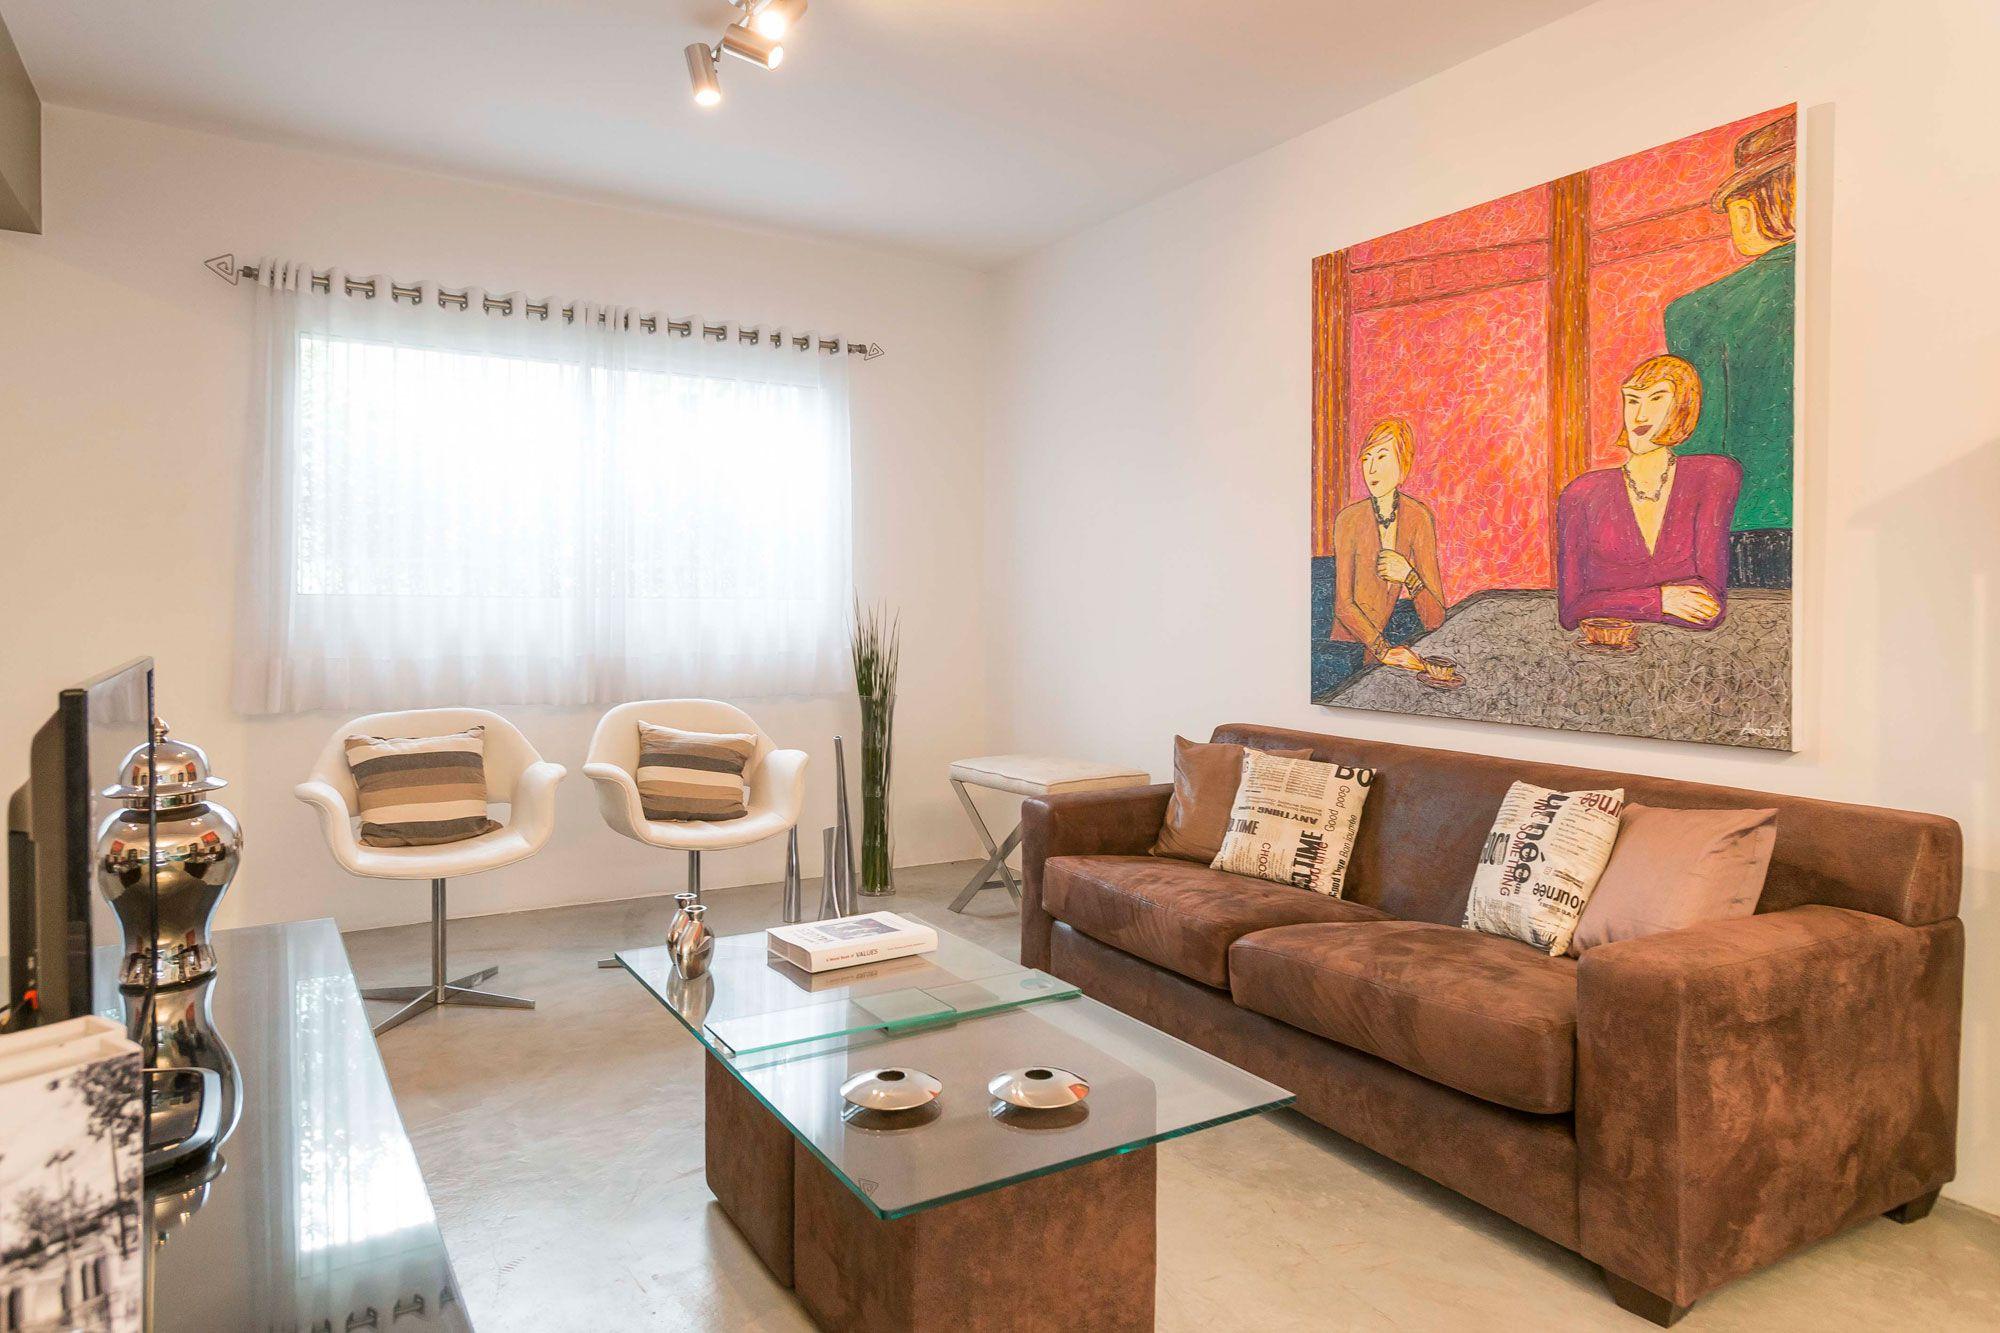 Granja-Julieta-Residence-11